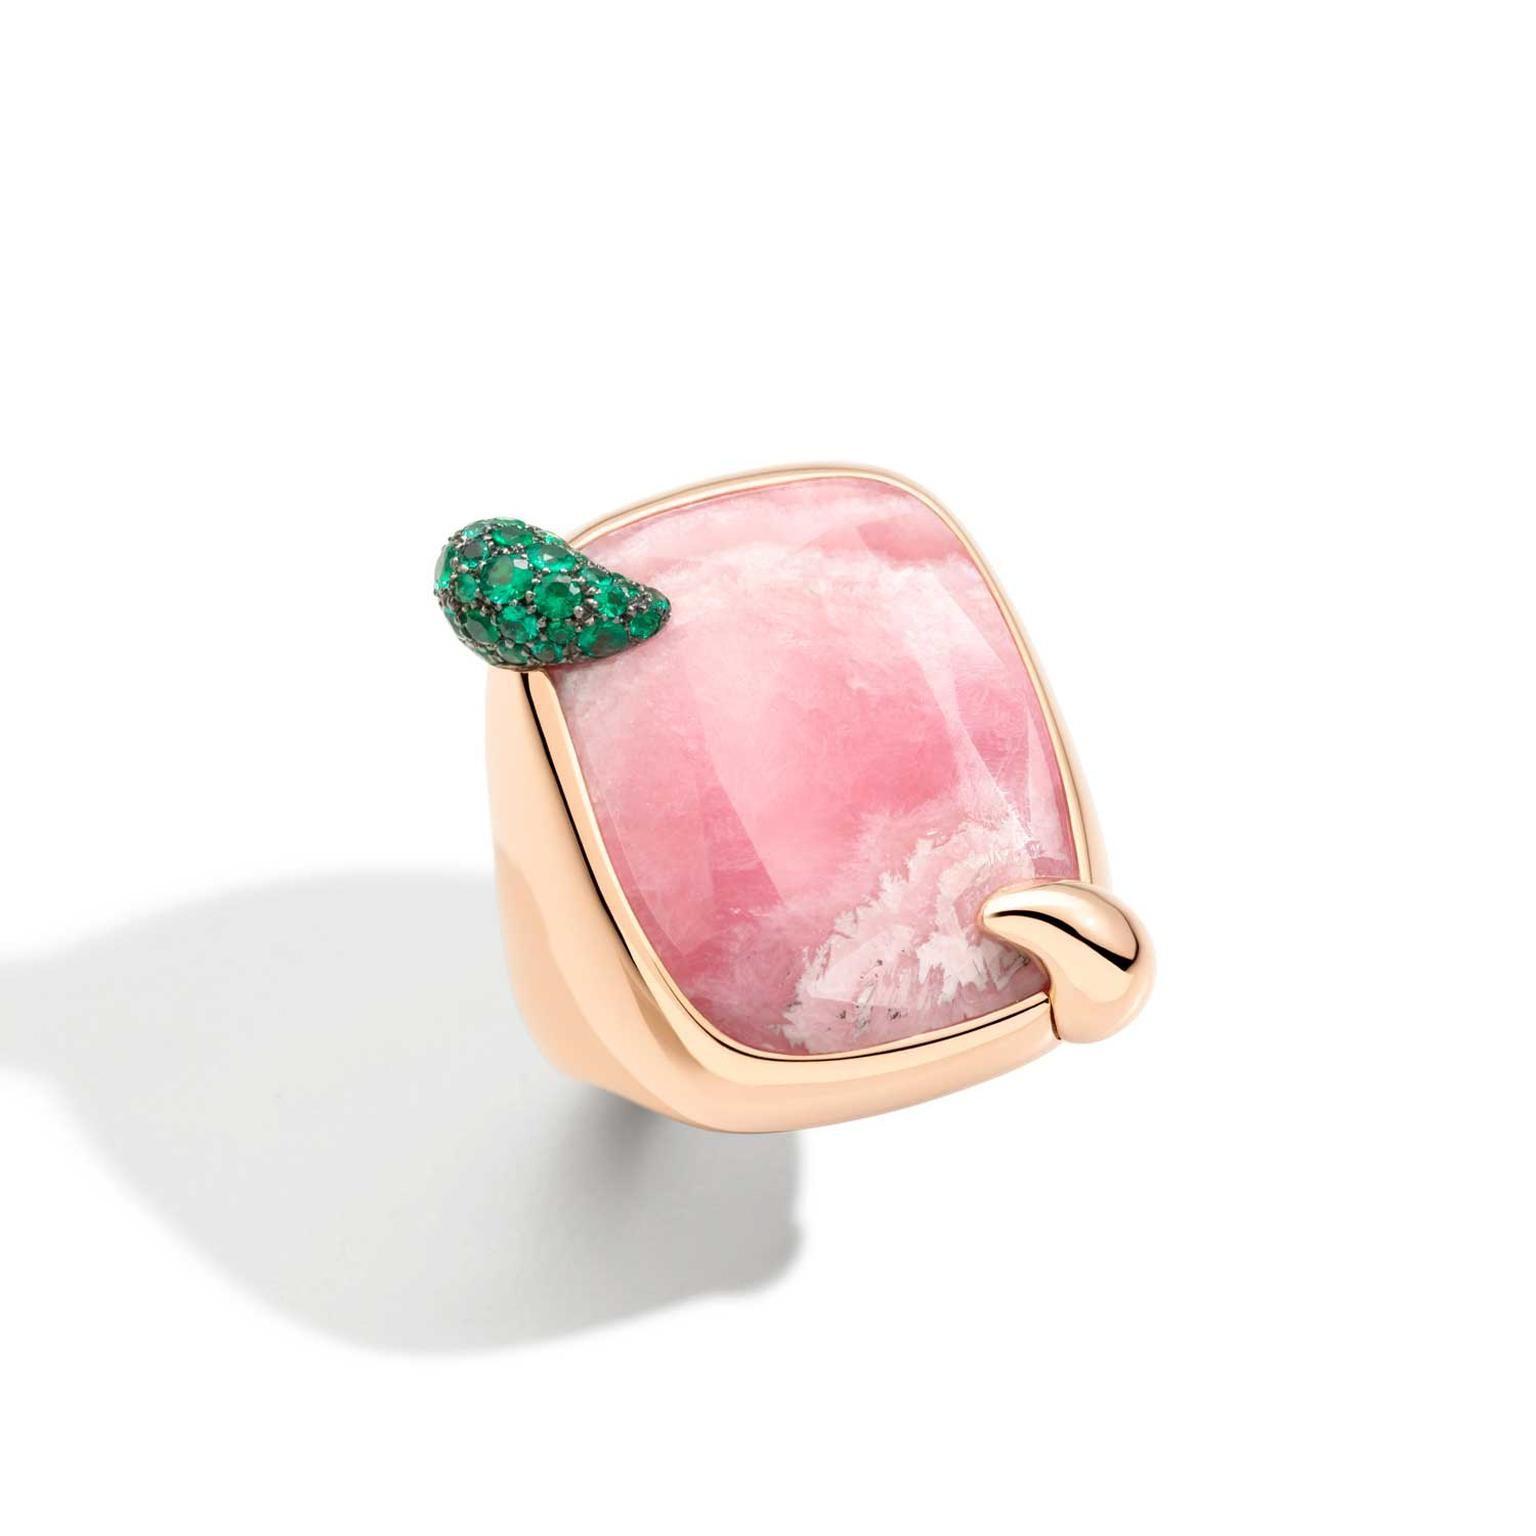 Pomellato Ritratto Pink Hawaiian Peony rhodochrosite ring